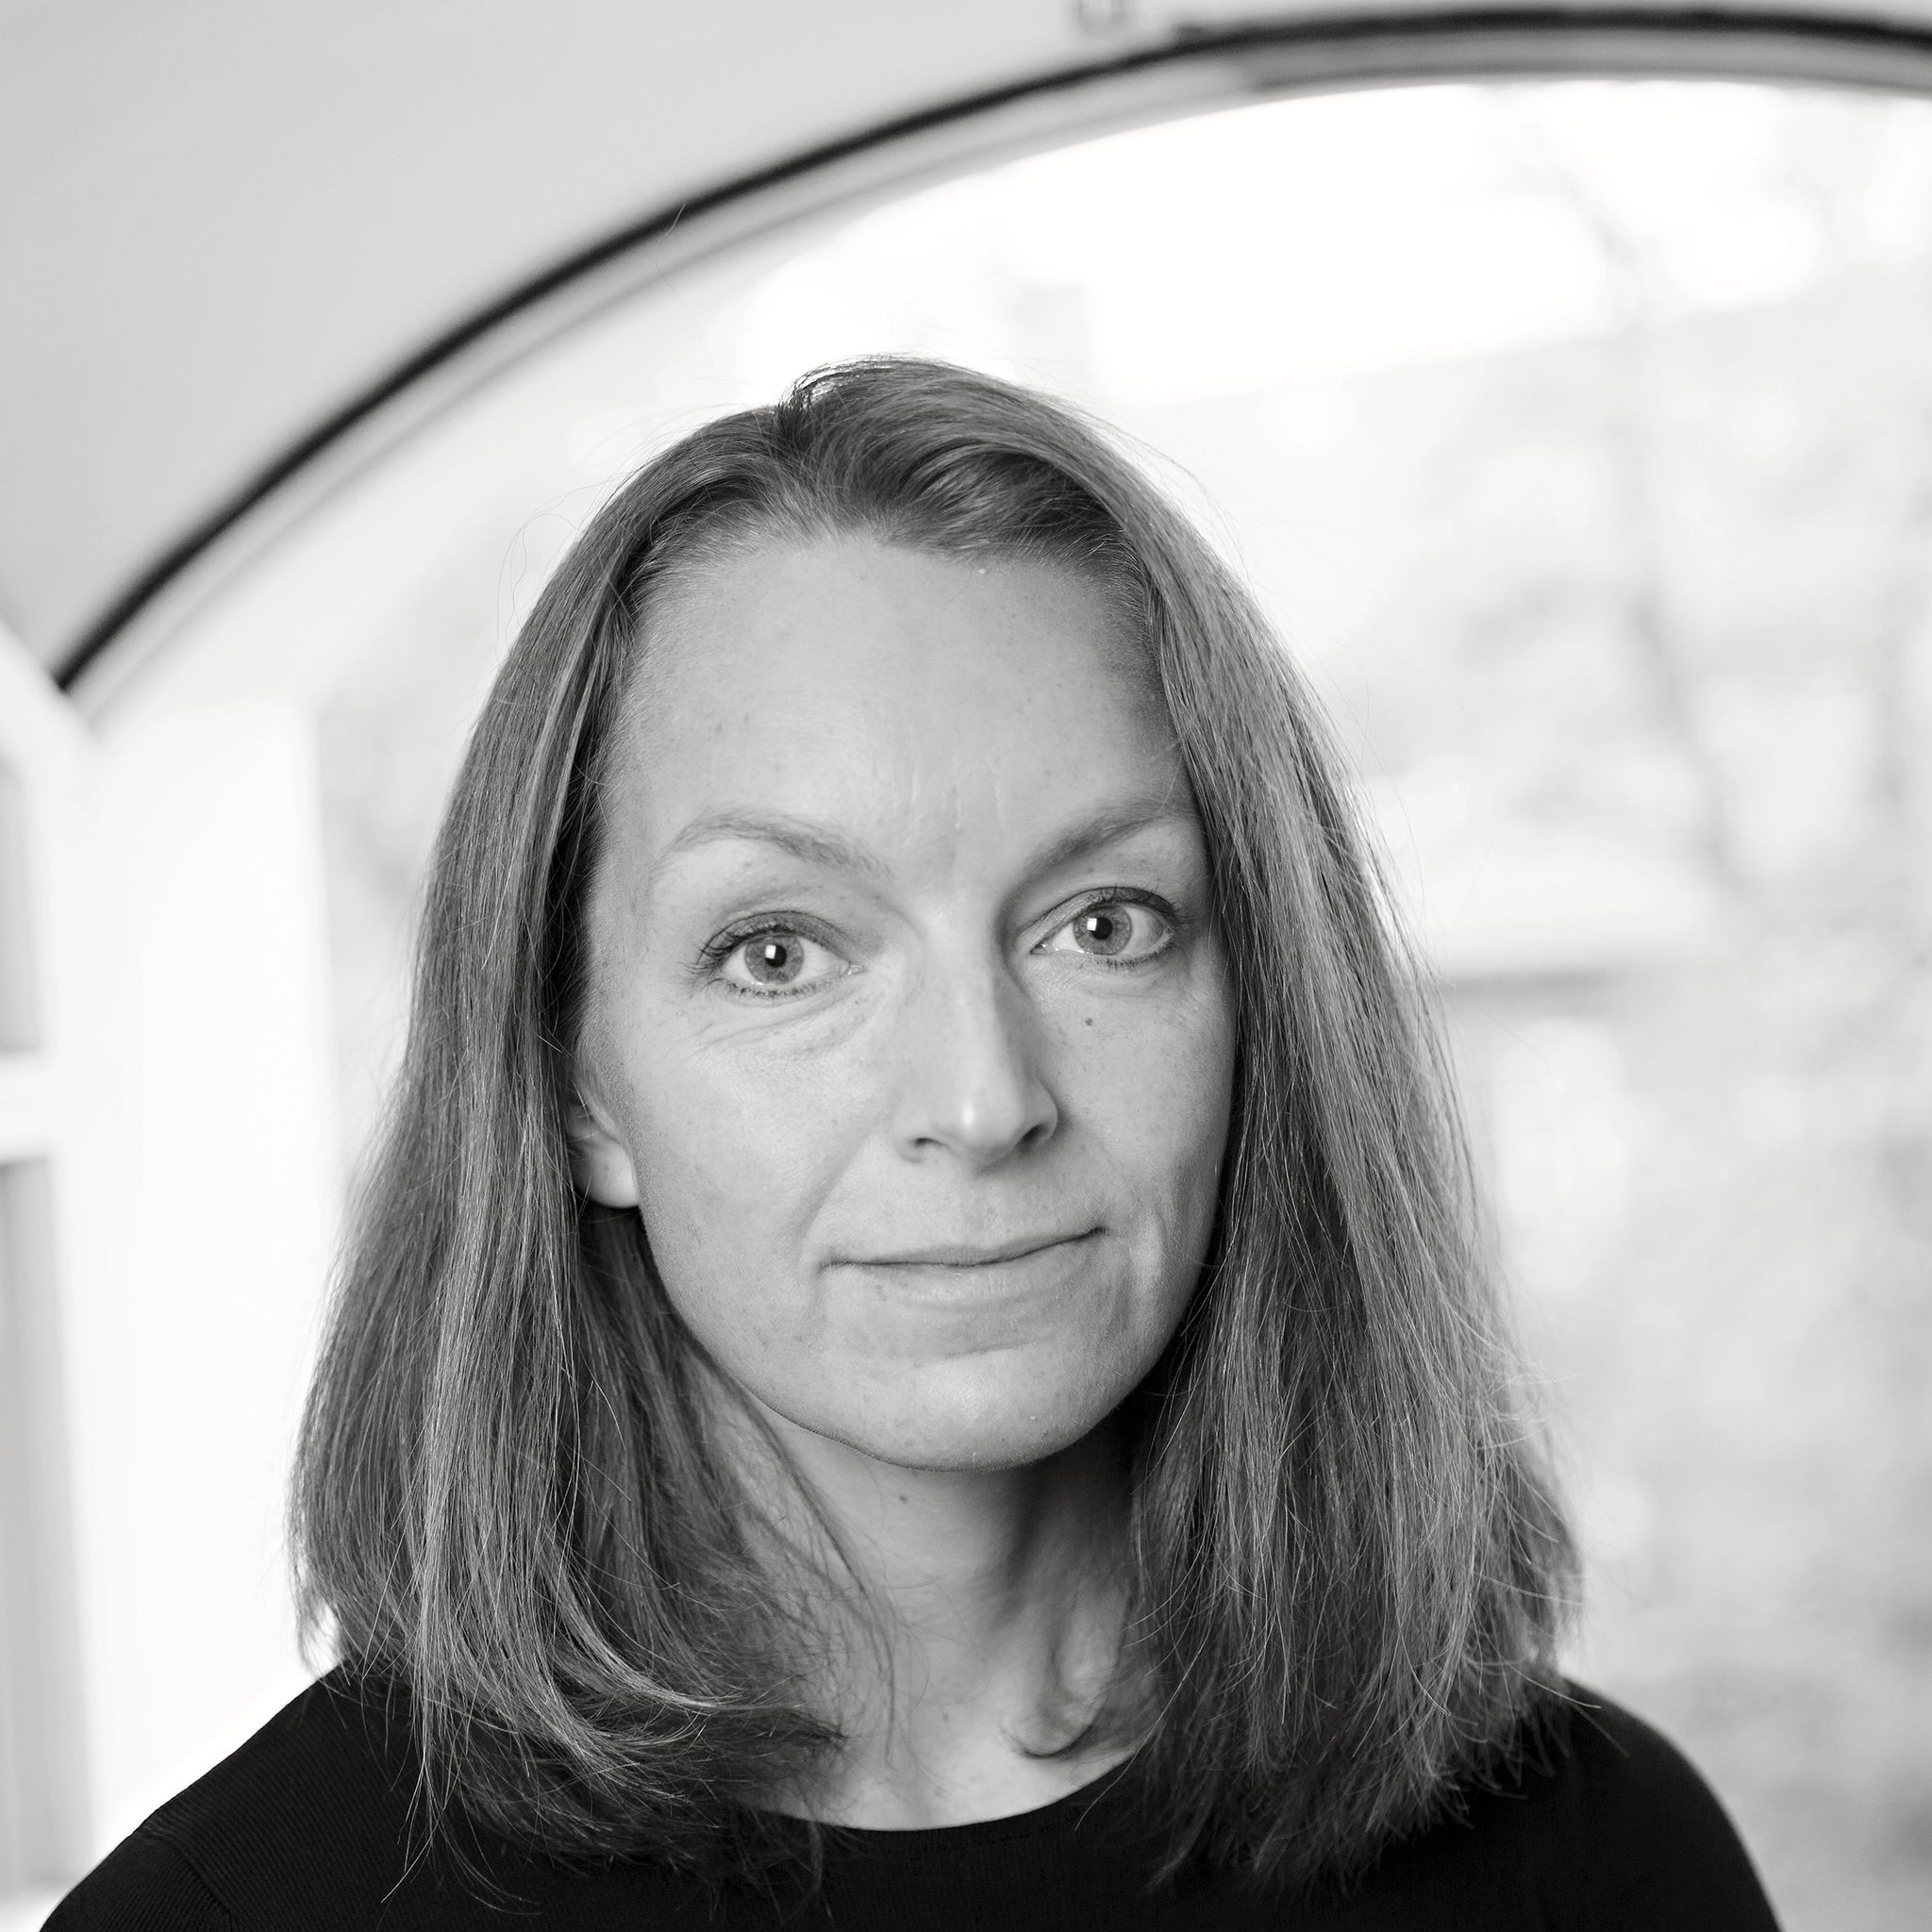 Margrethe Zacho Haarde